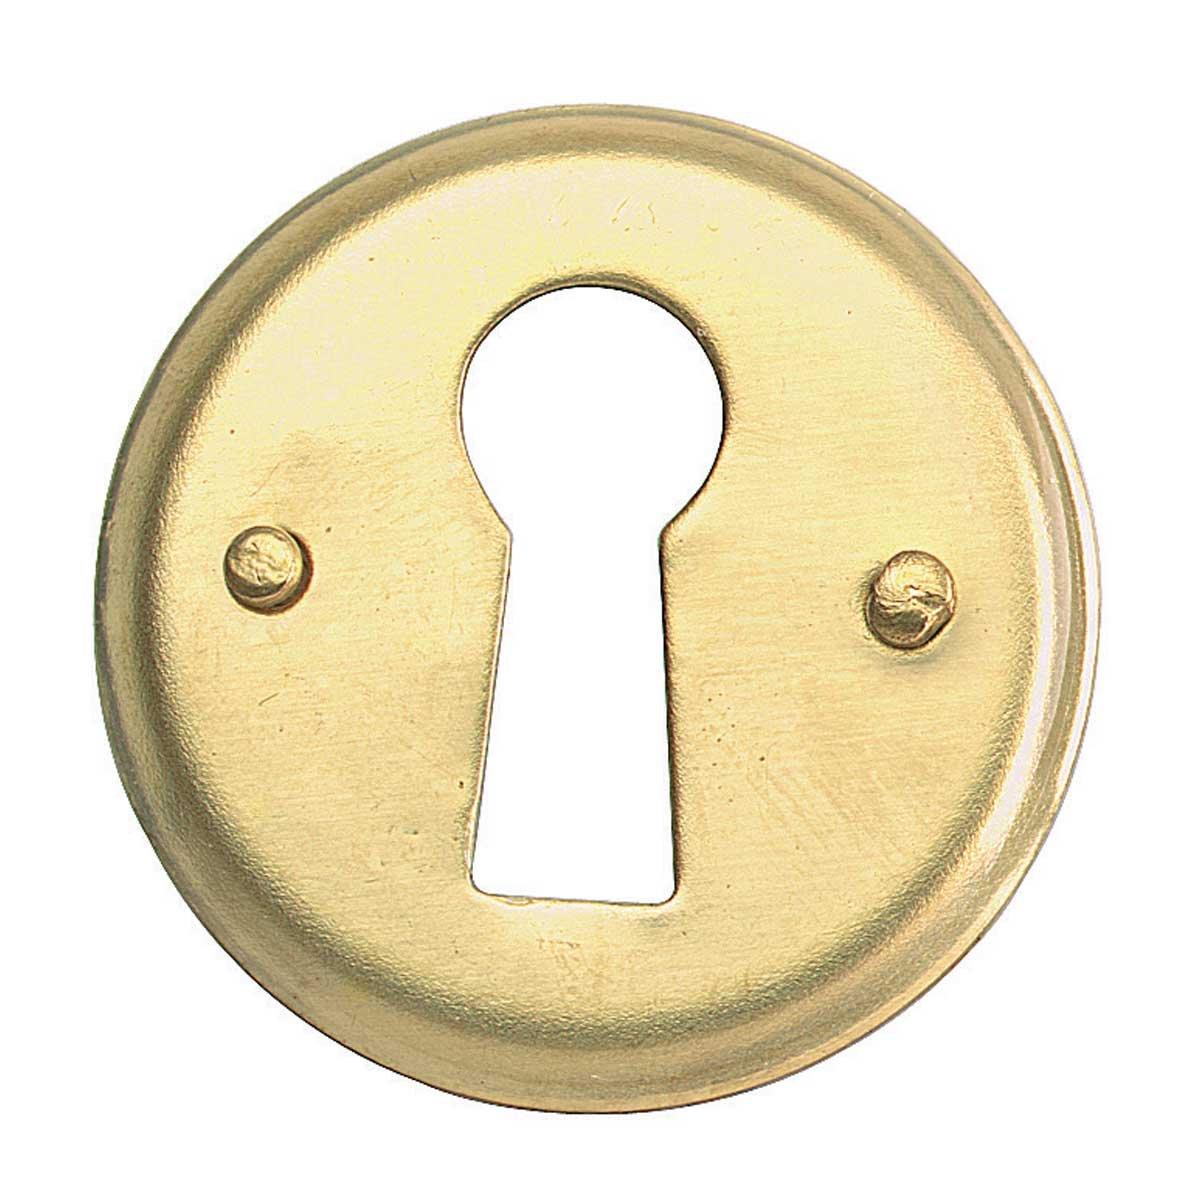 Solid Ebony Beehive Escutcheon With Brass Backplate Door Furniture: Keyhole Covers: Amazon.com